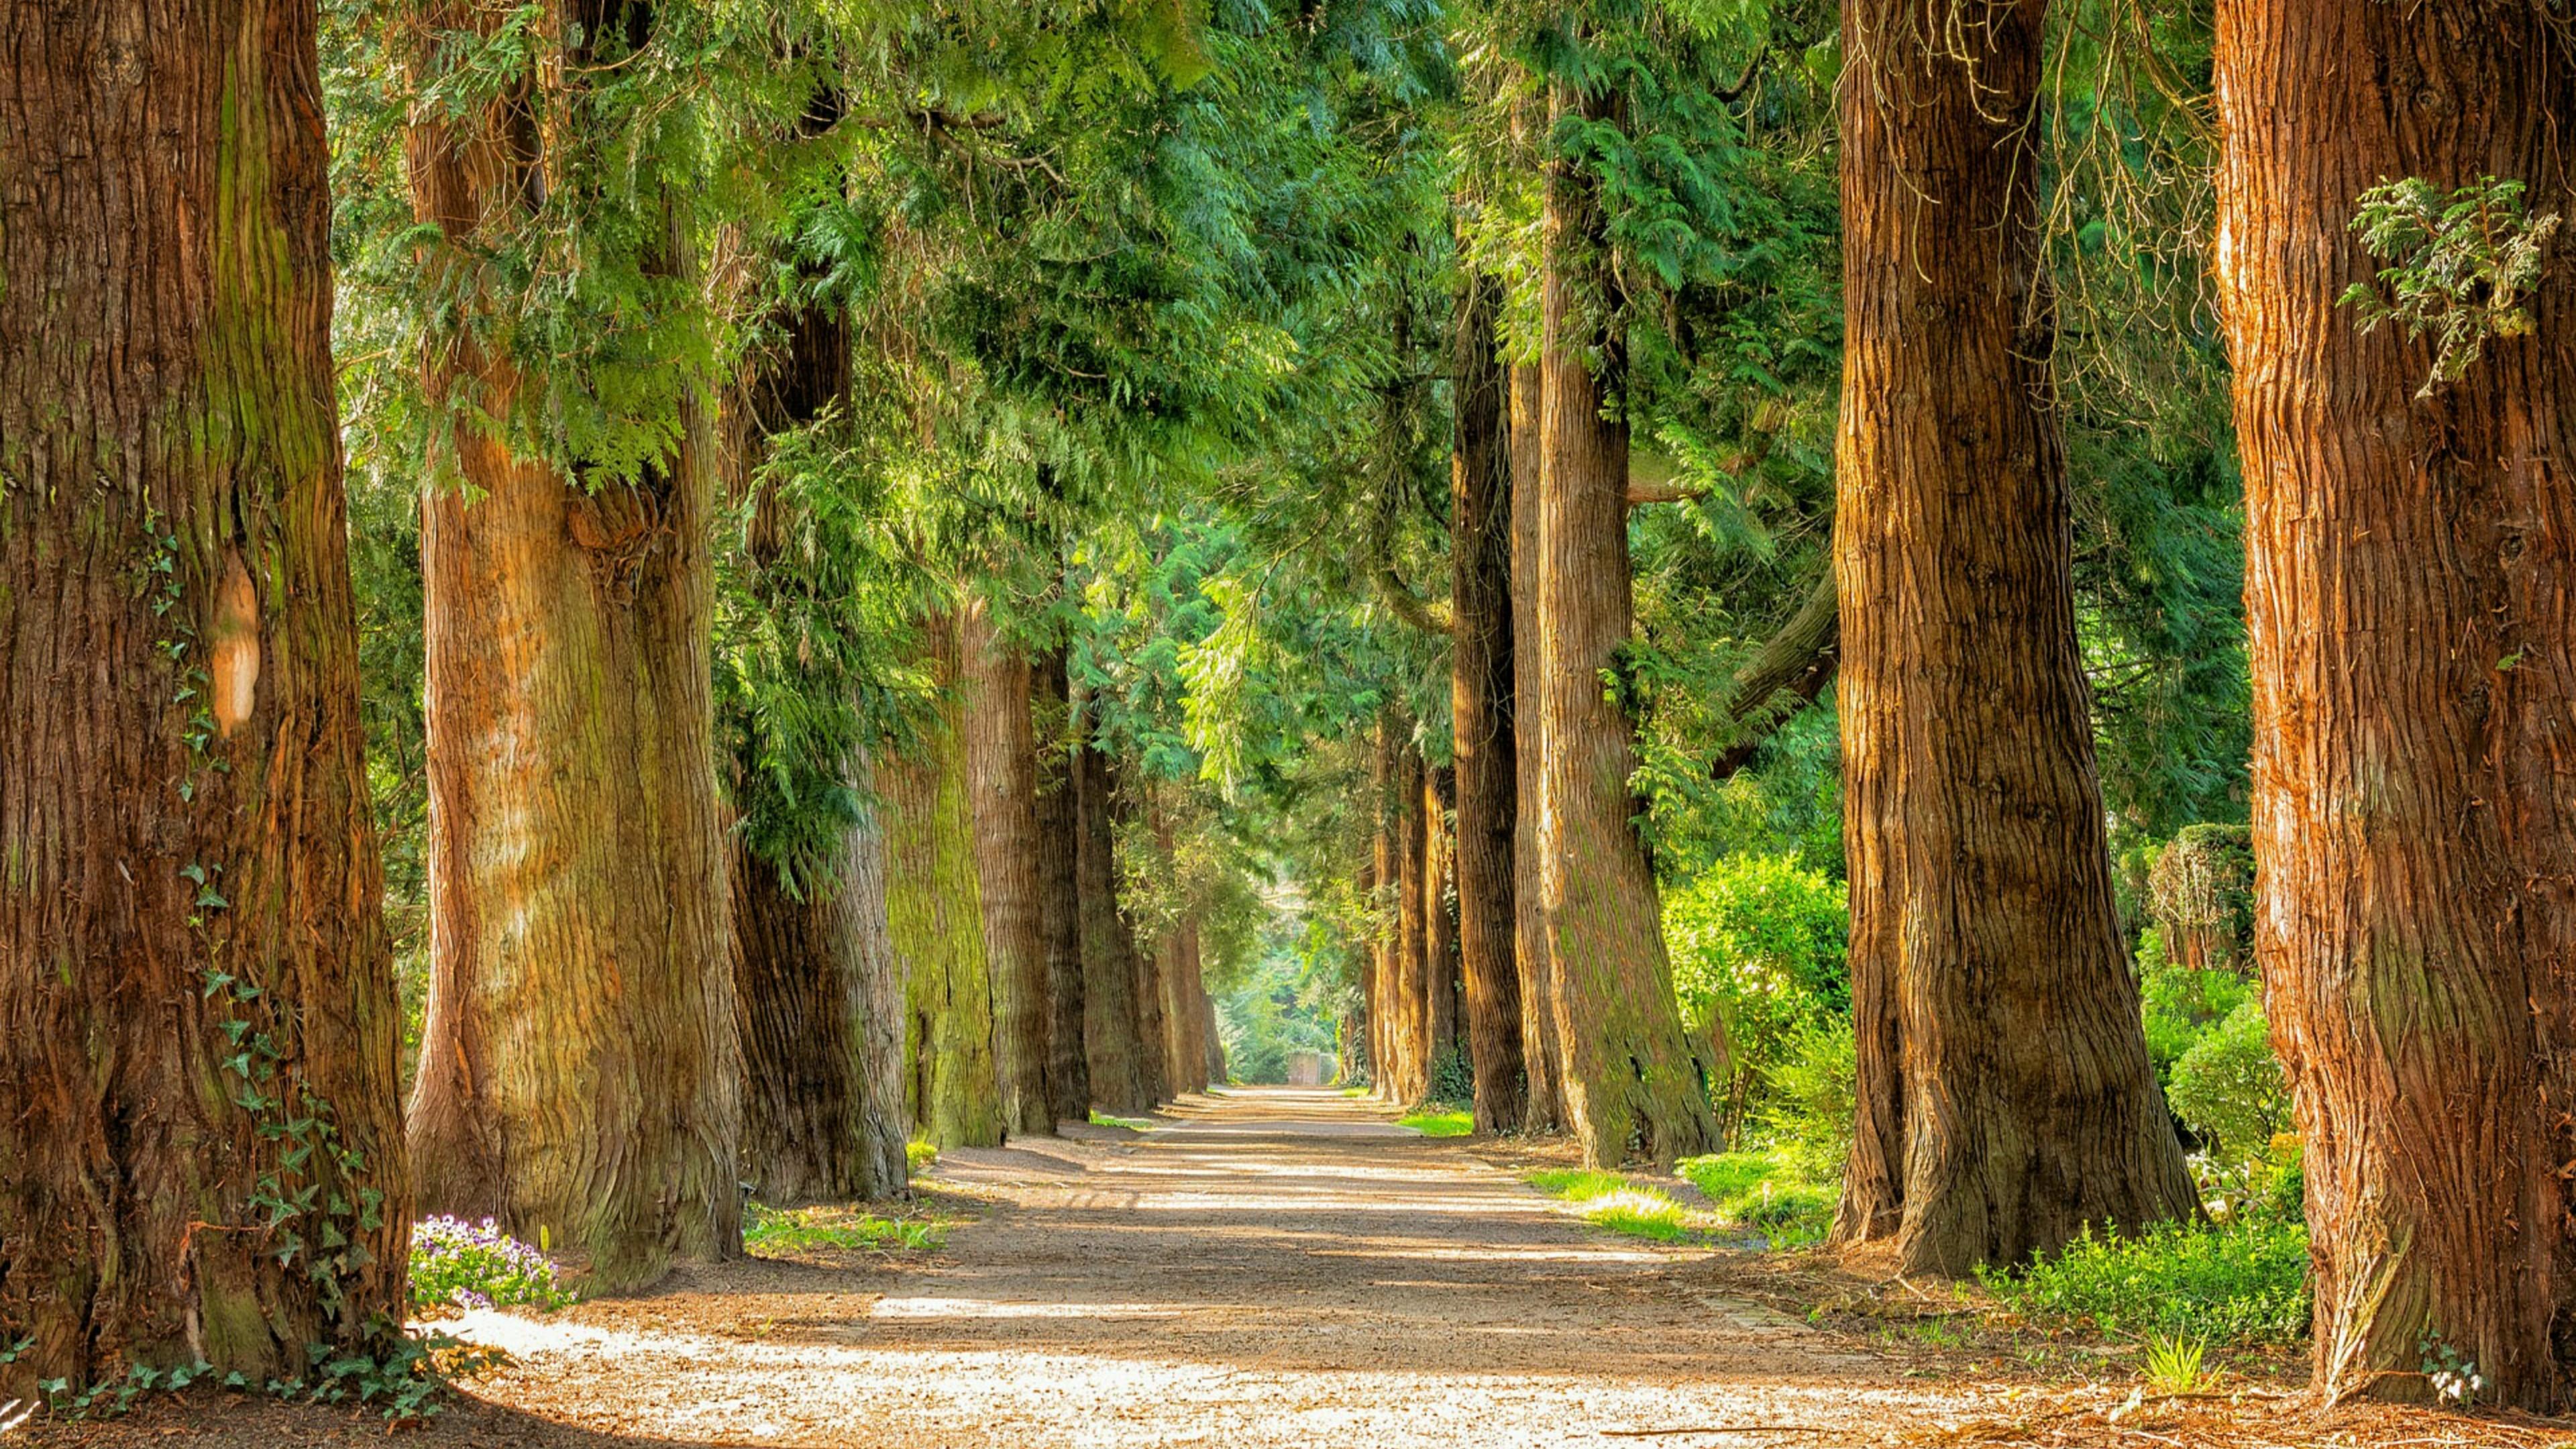 Tree lane wallpaper